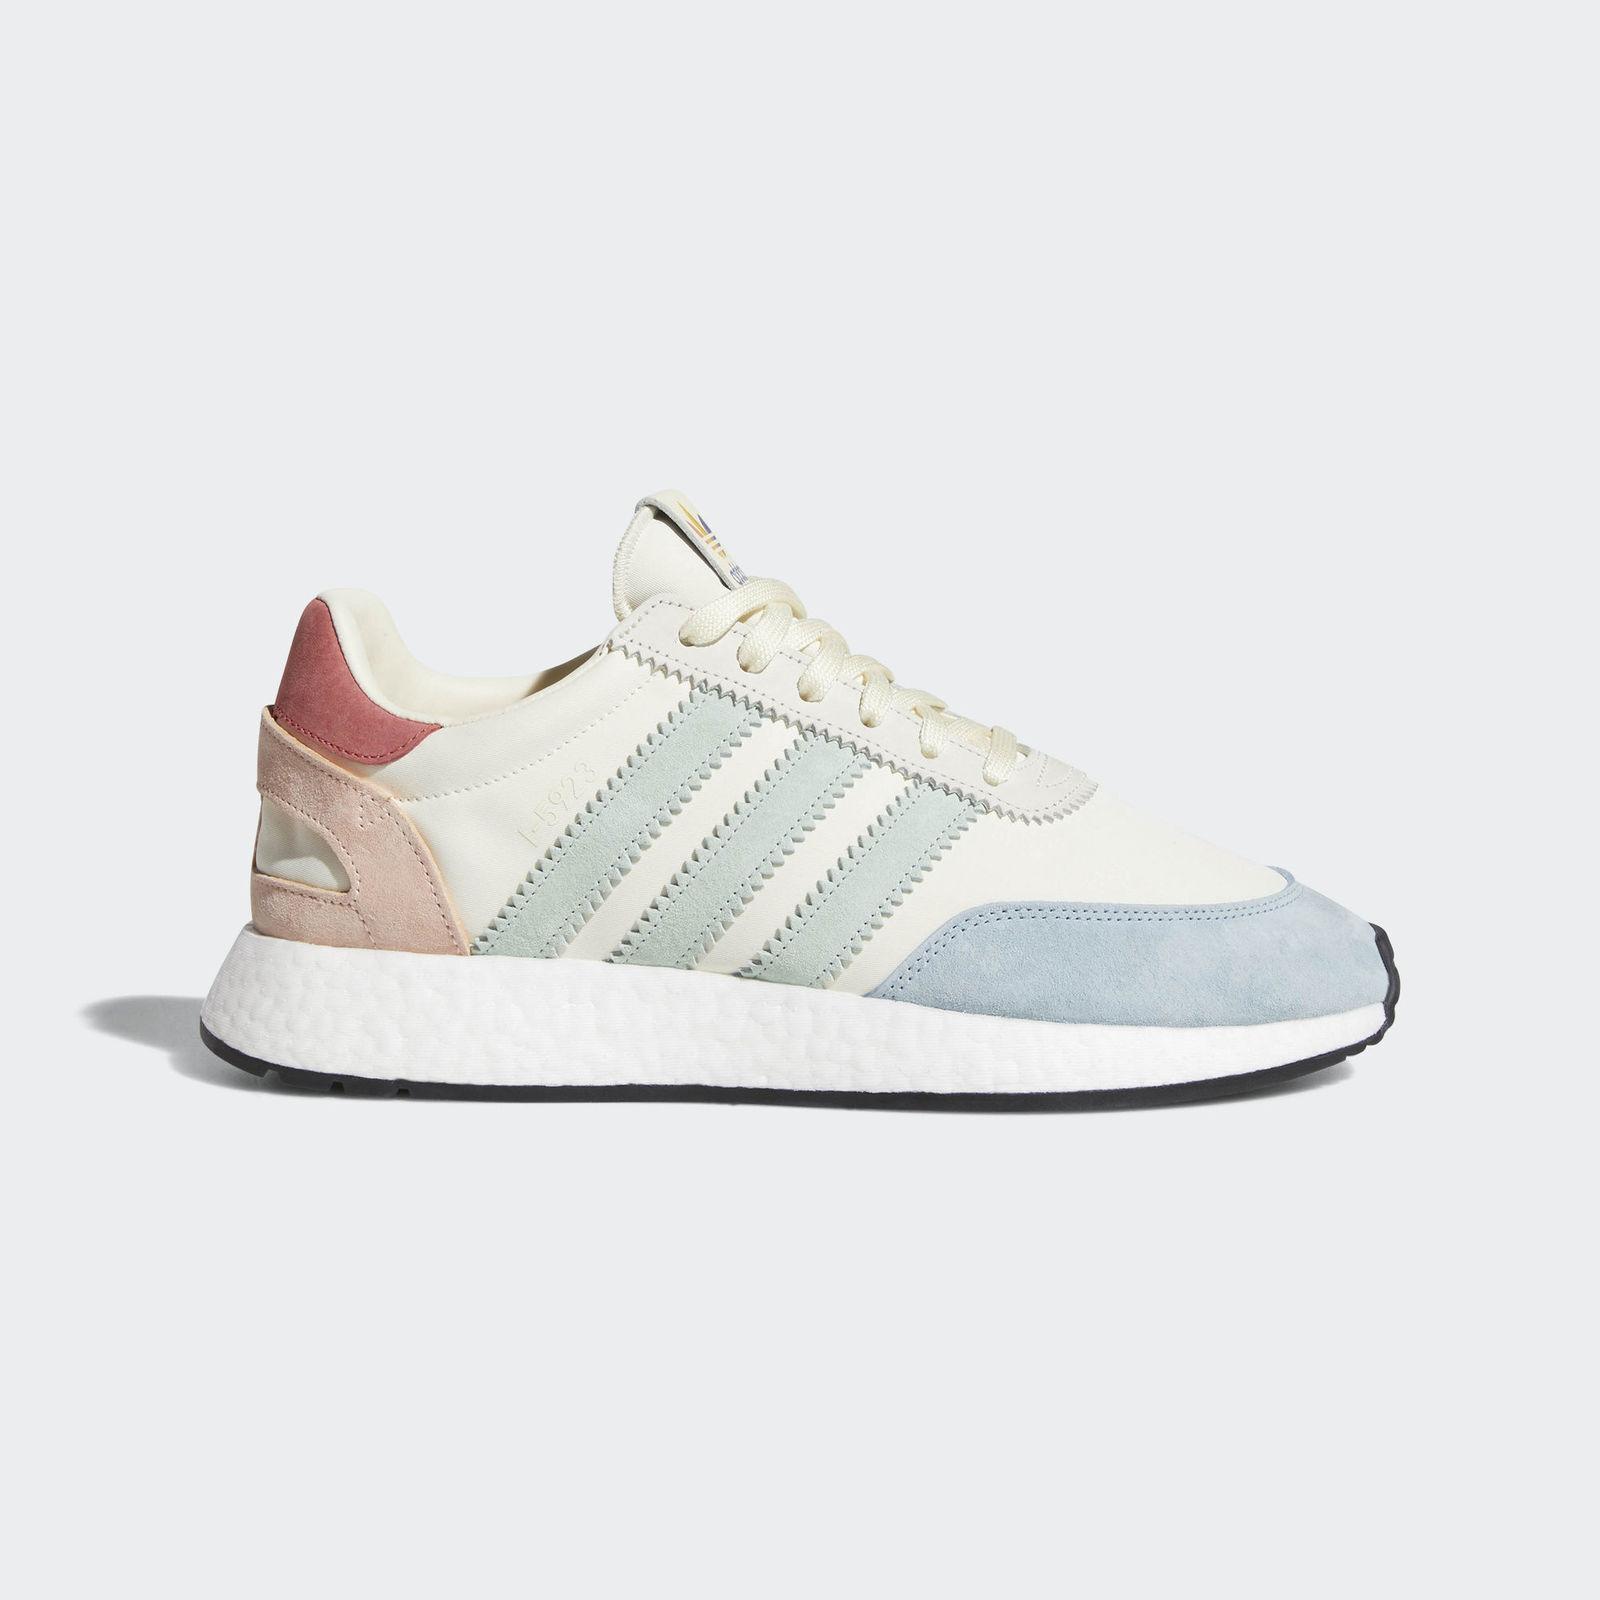 Adidas I-5923 Iniki Pride size 13. Cream Ash Green Red . Multi color B41984 nmd